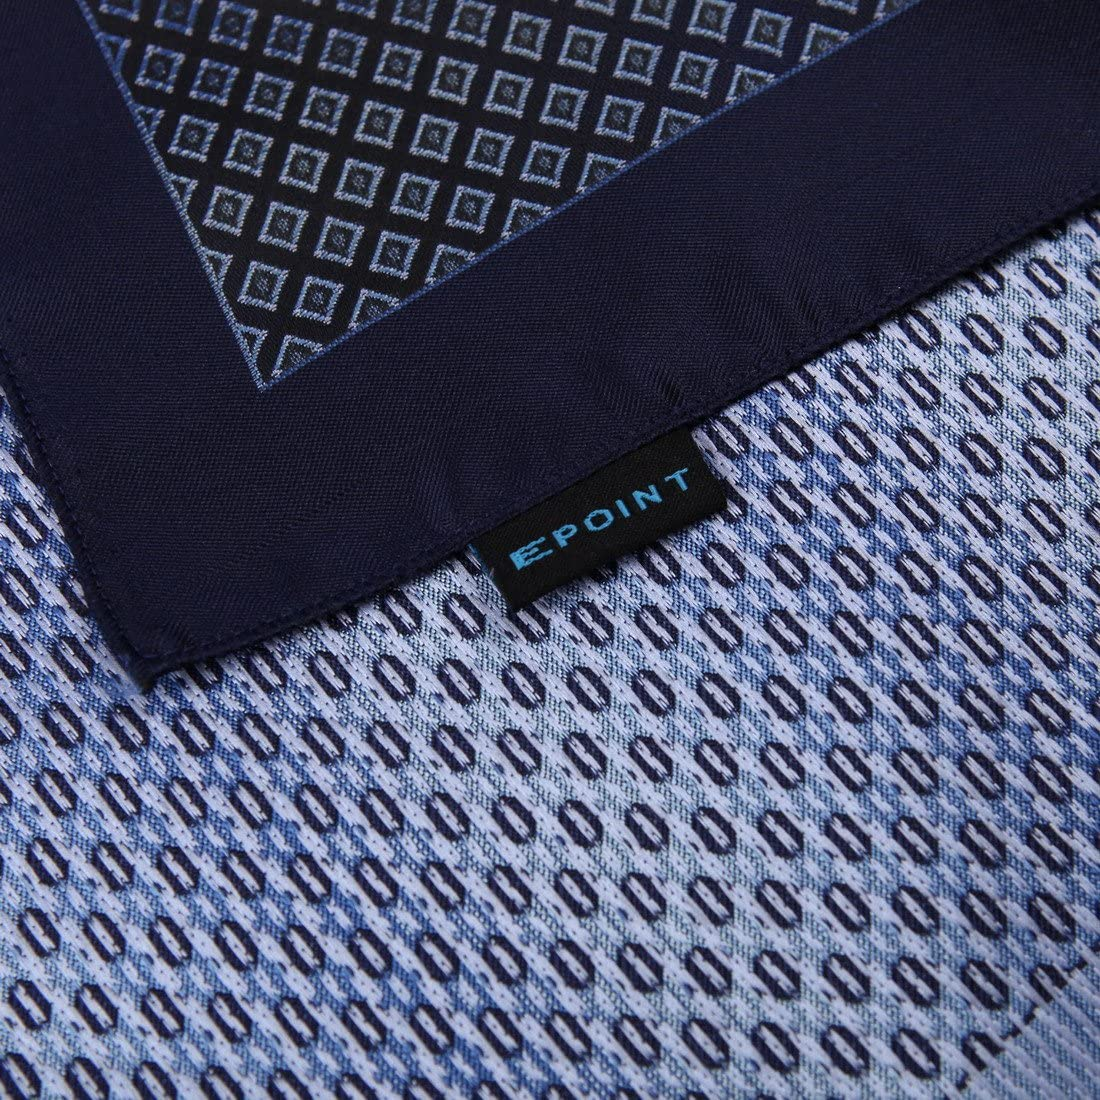 Epoint Mens Fashion Groom Patterned Microfiber Handkerchief Inspire For Mens Hanky